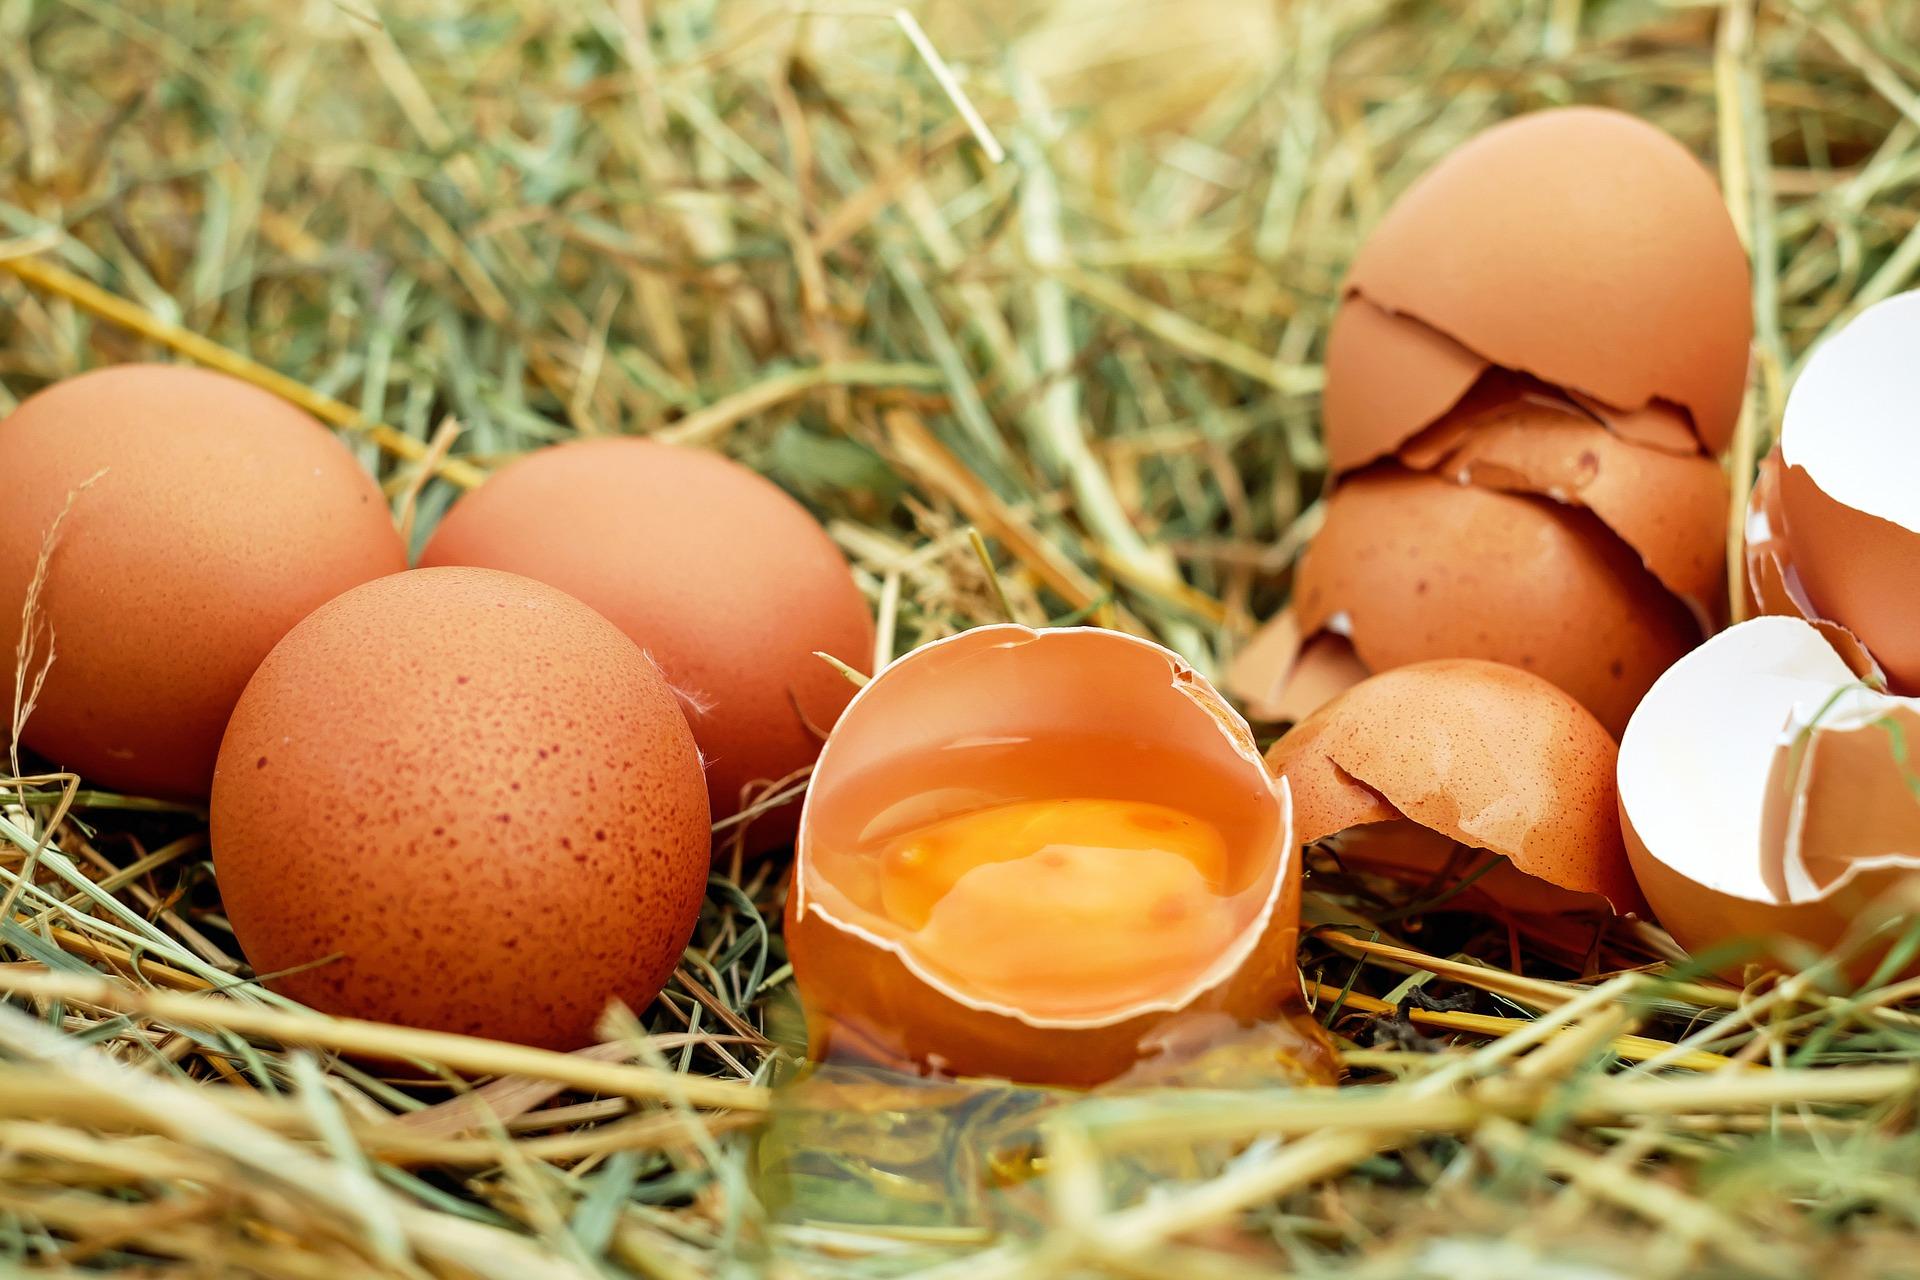 Cena jaj rośnie